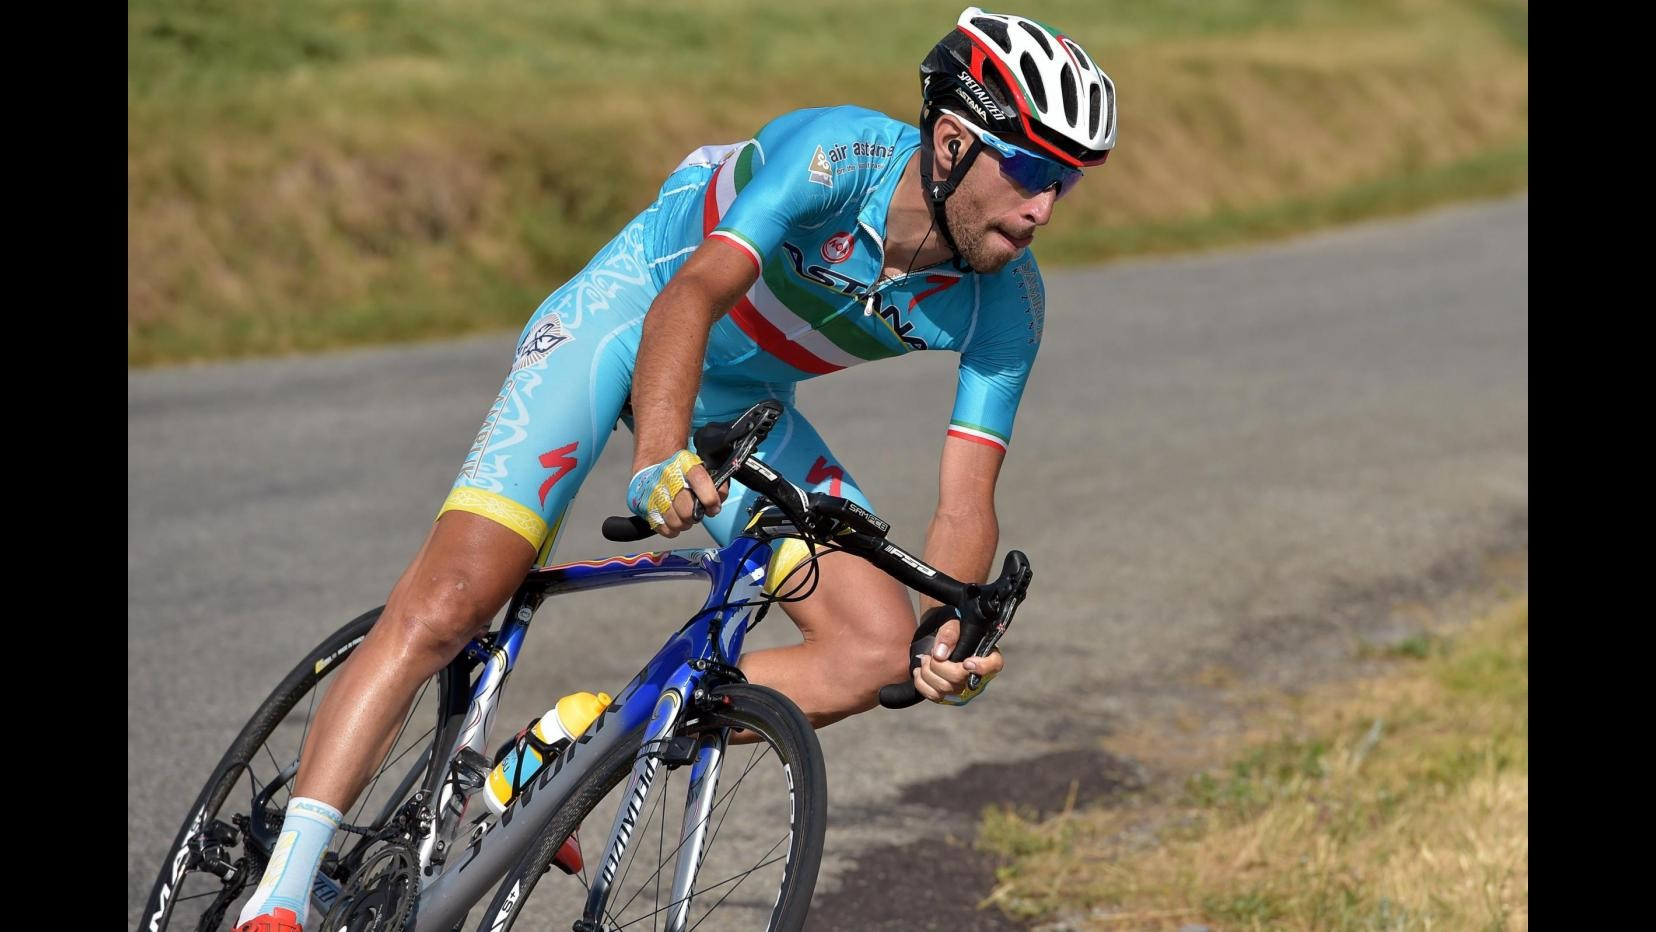 Ciclismo, Tre Valli Varesine: vince Nibali, terzo Nizzolo